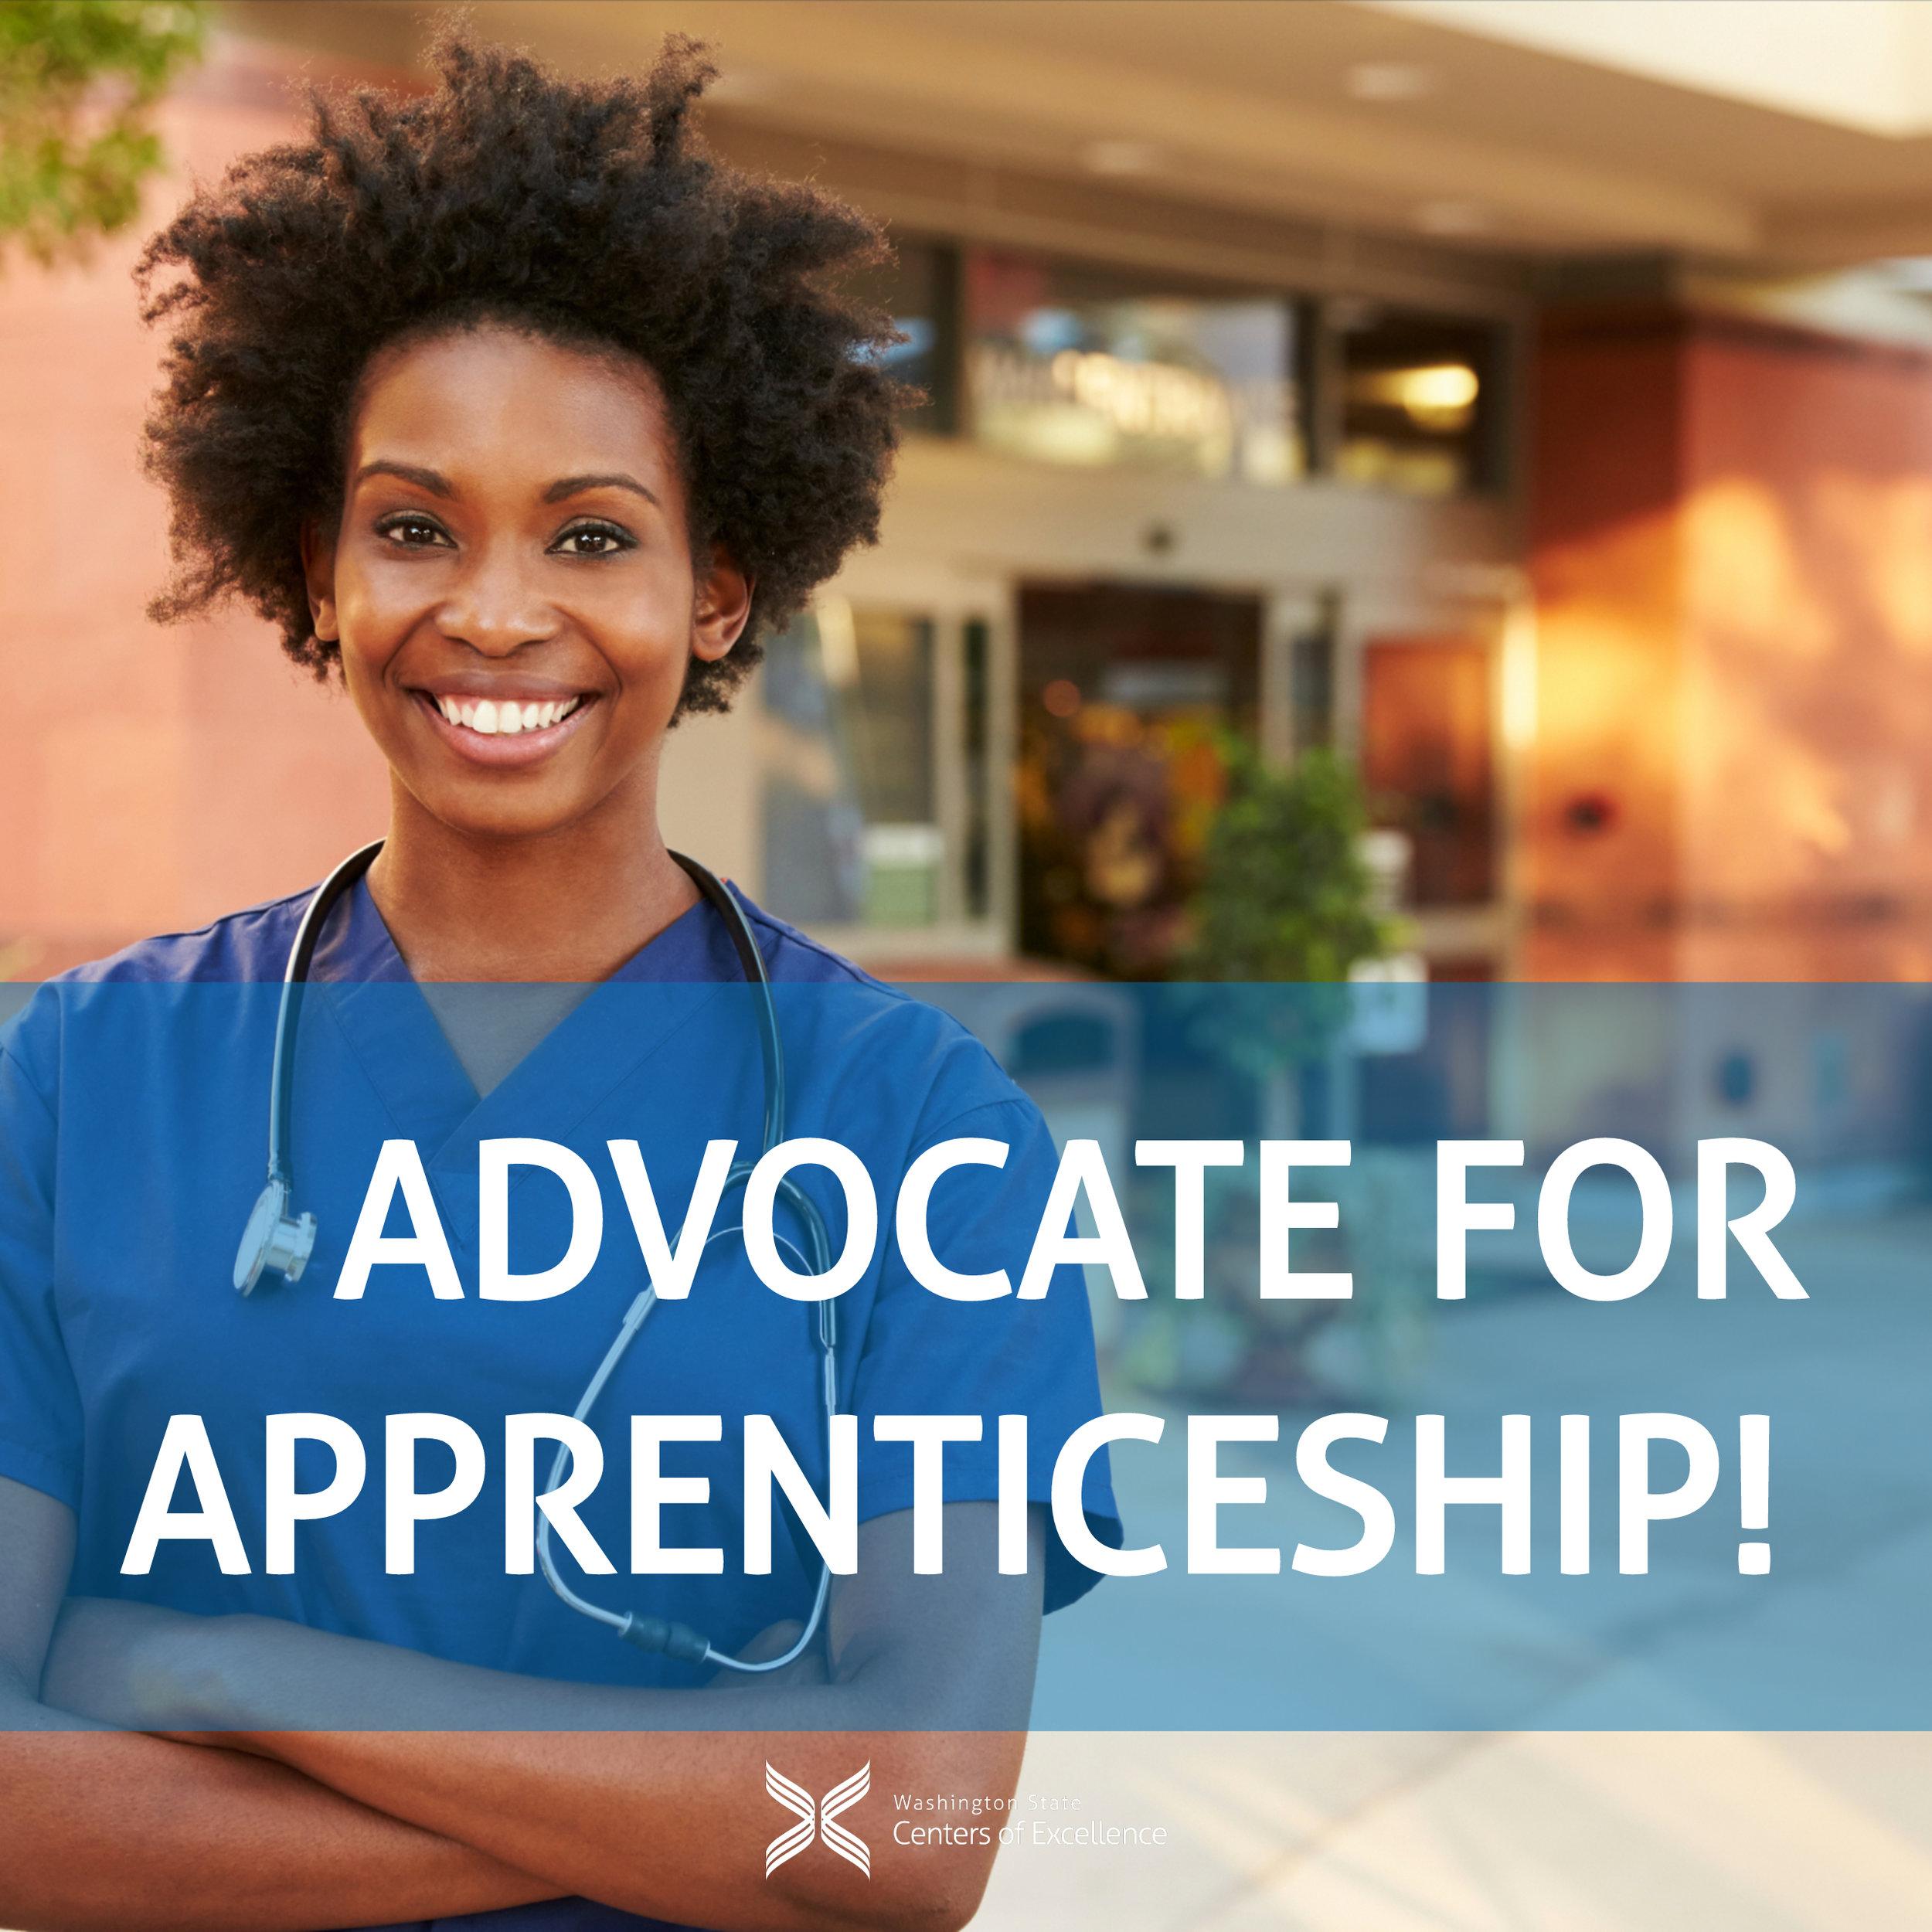 """Advocate for Apprenticeship"" - Nurse apprentice standing in front of building"